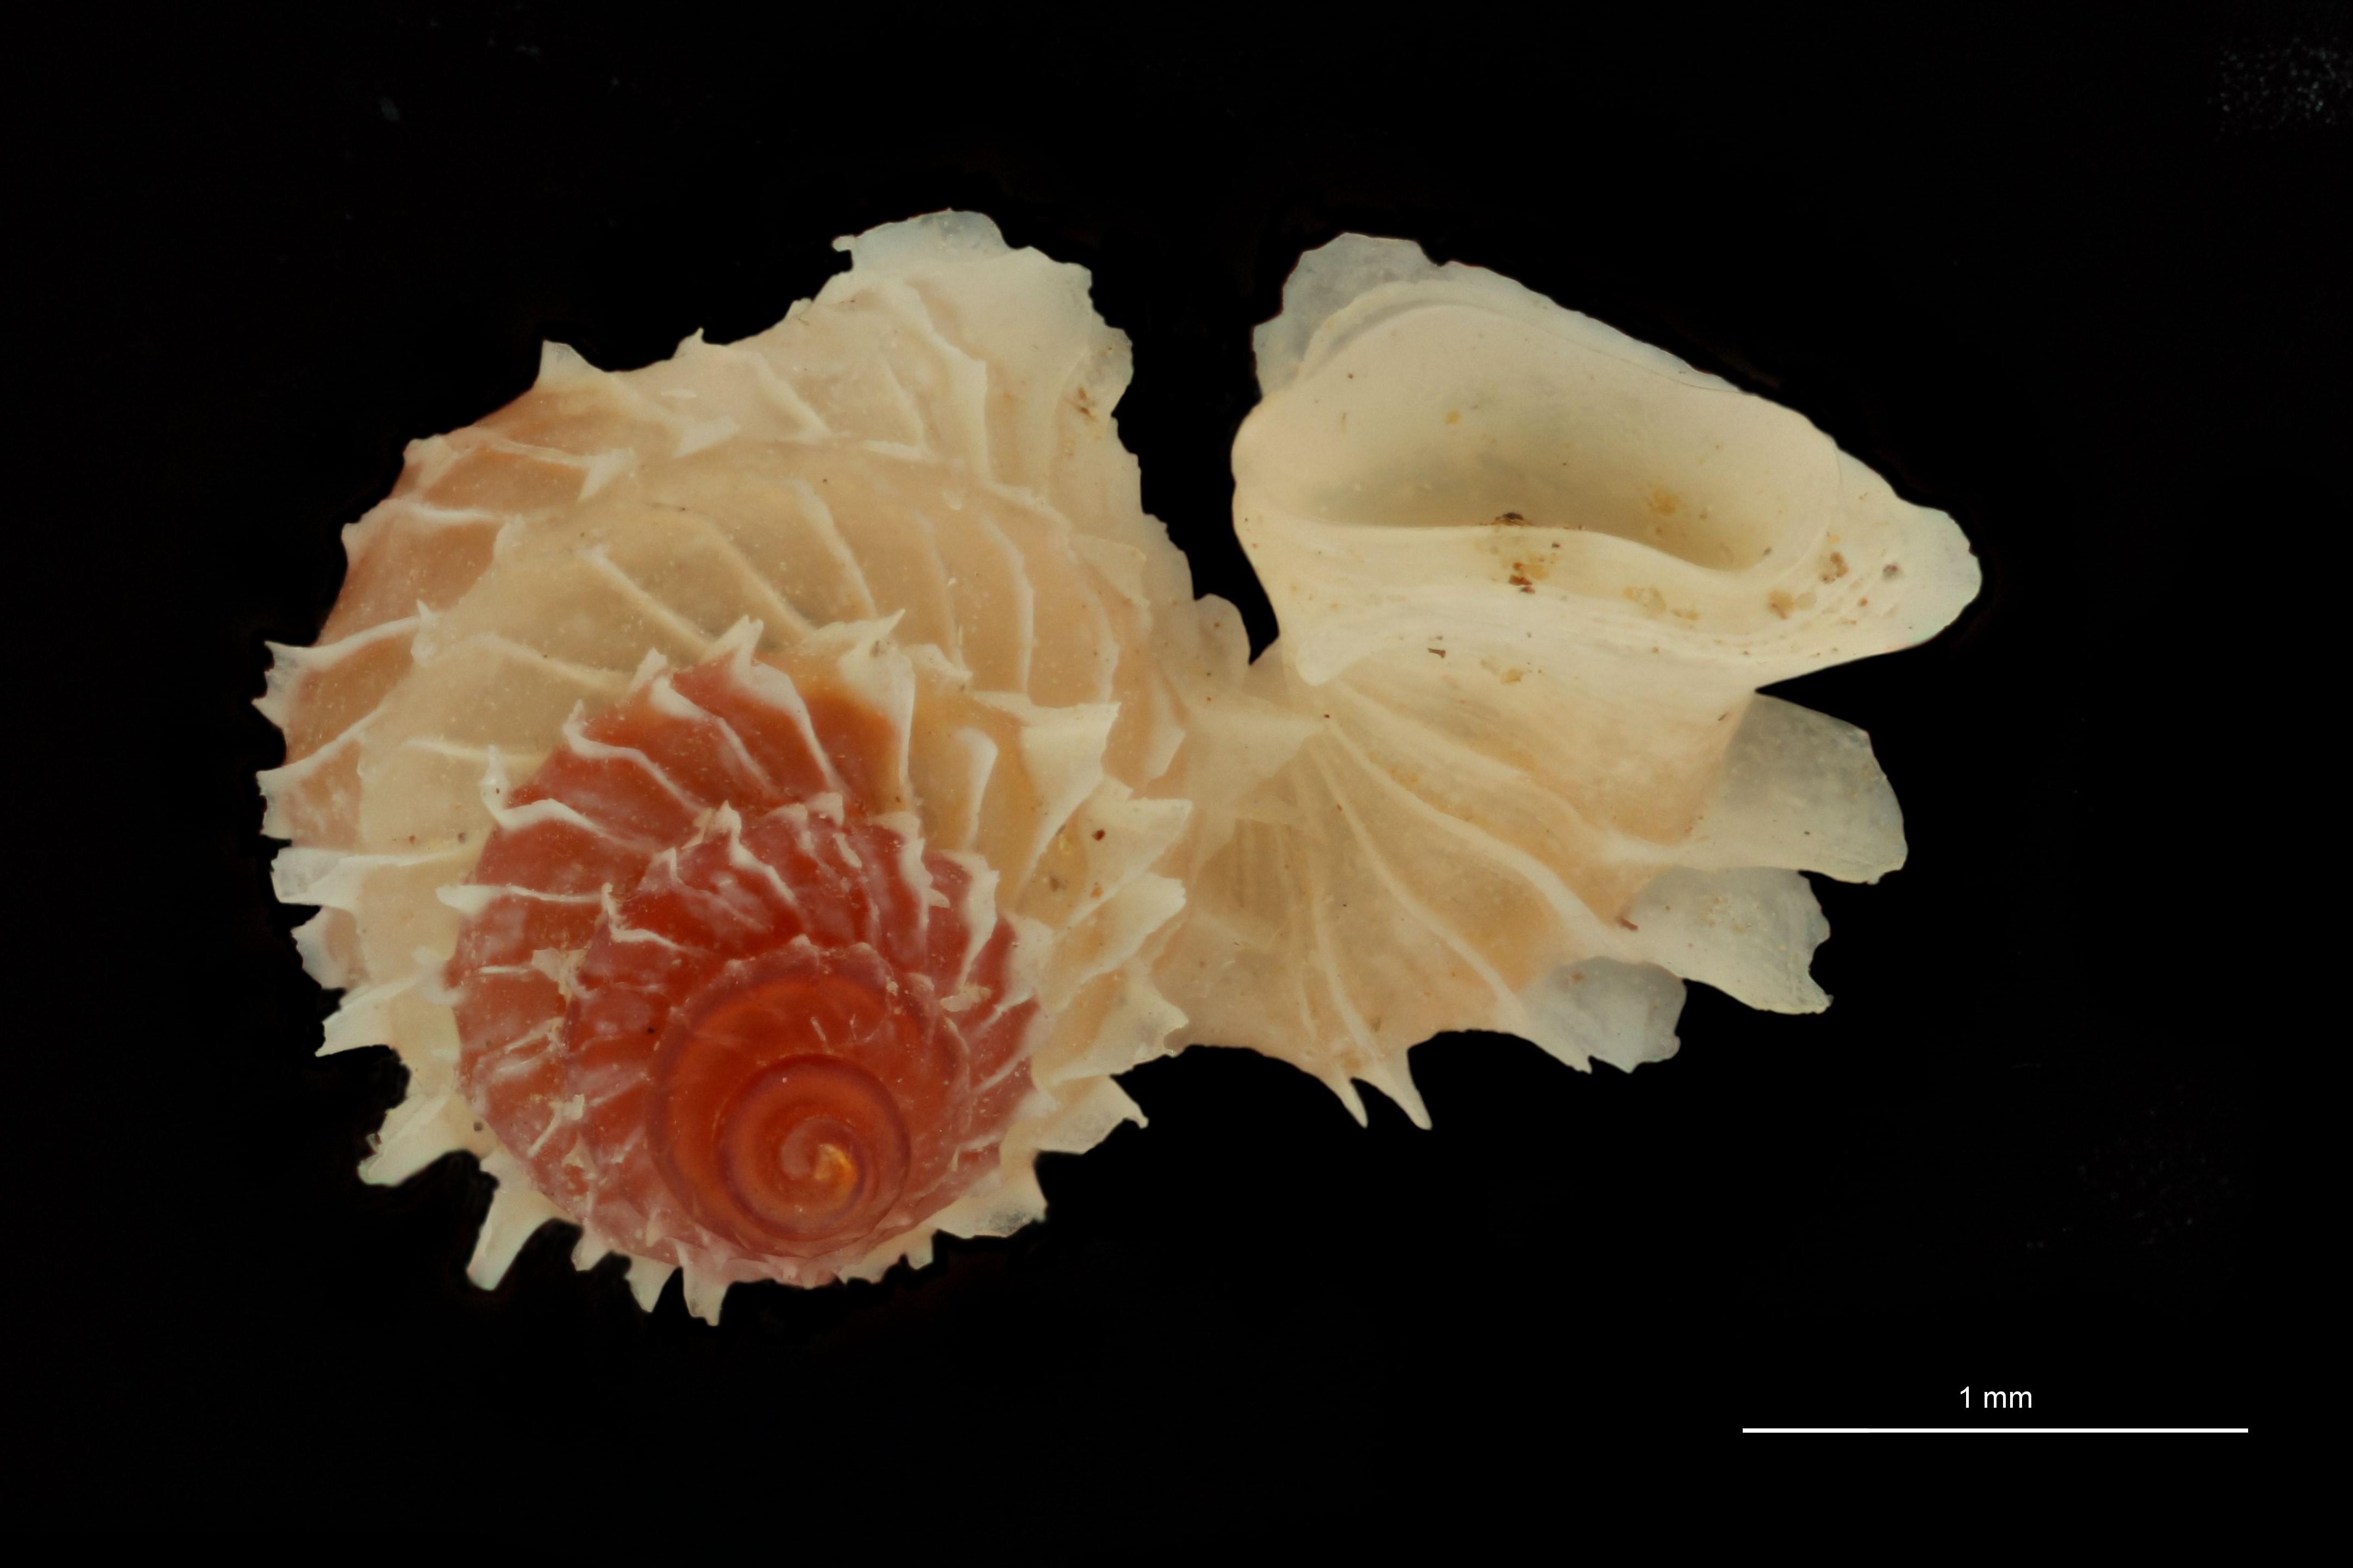 BE-RBINS-INV PARATYPE MT 1032 Opisthostoma (Geothauma) linterae LATERAL.jpg